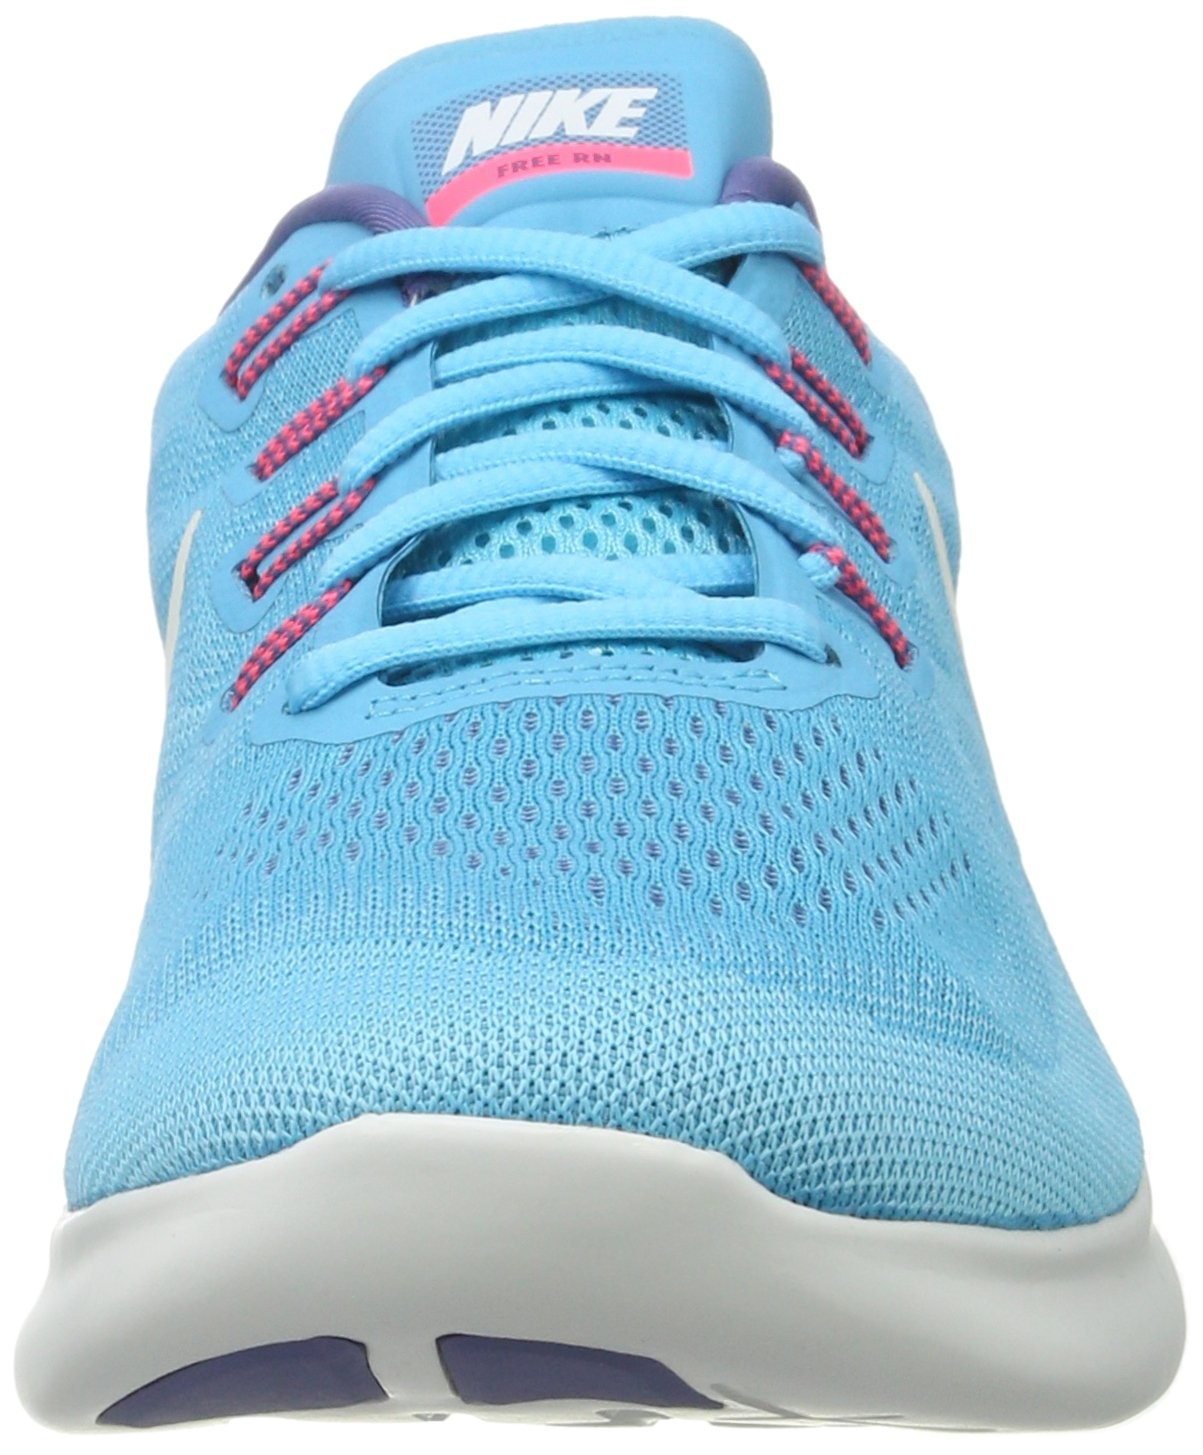 best service a93f8 587e3 ... NIKE Women s Free RN 2017 Running Running Running Shoe B01K0NQD9S 7  B(M) US ...